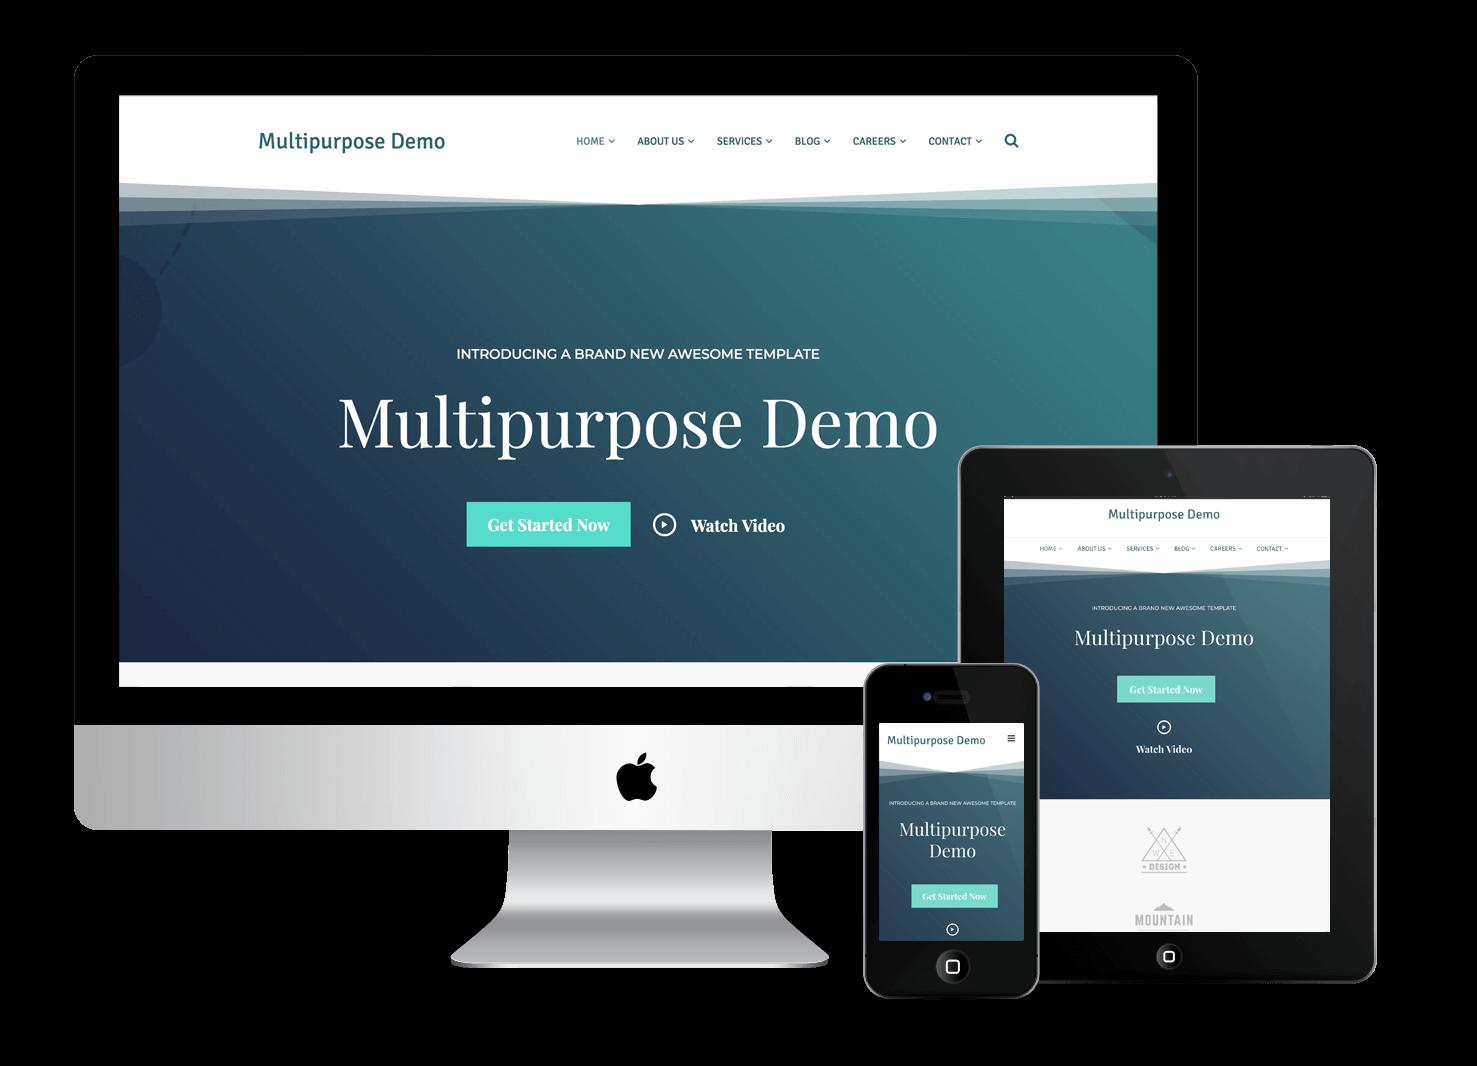 Multipurpose Demo Mobile Responsive